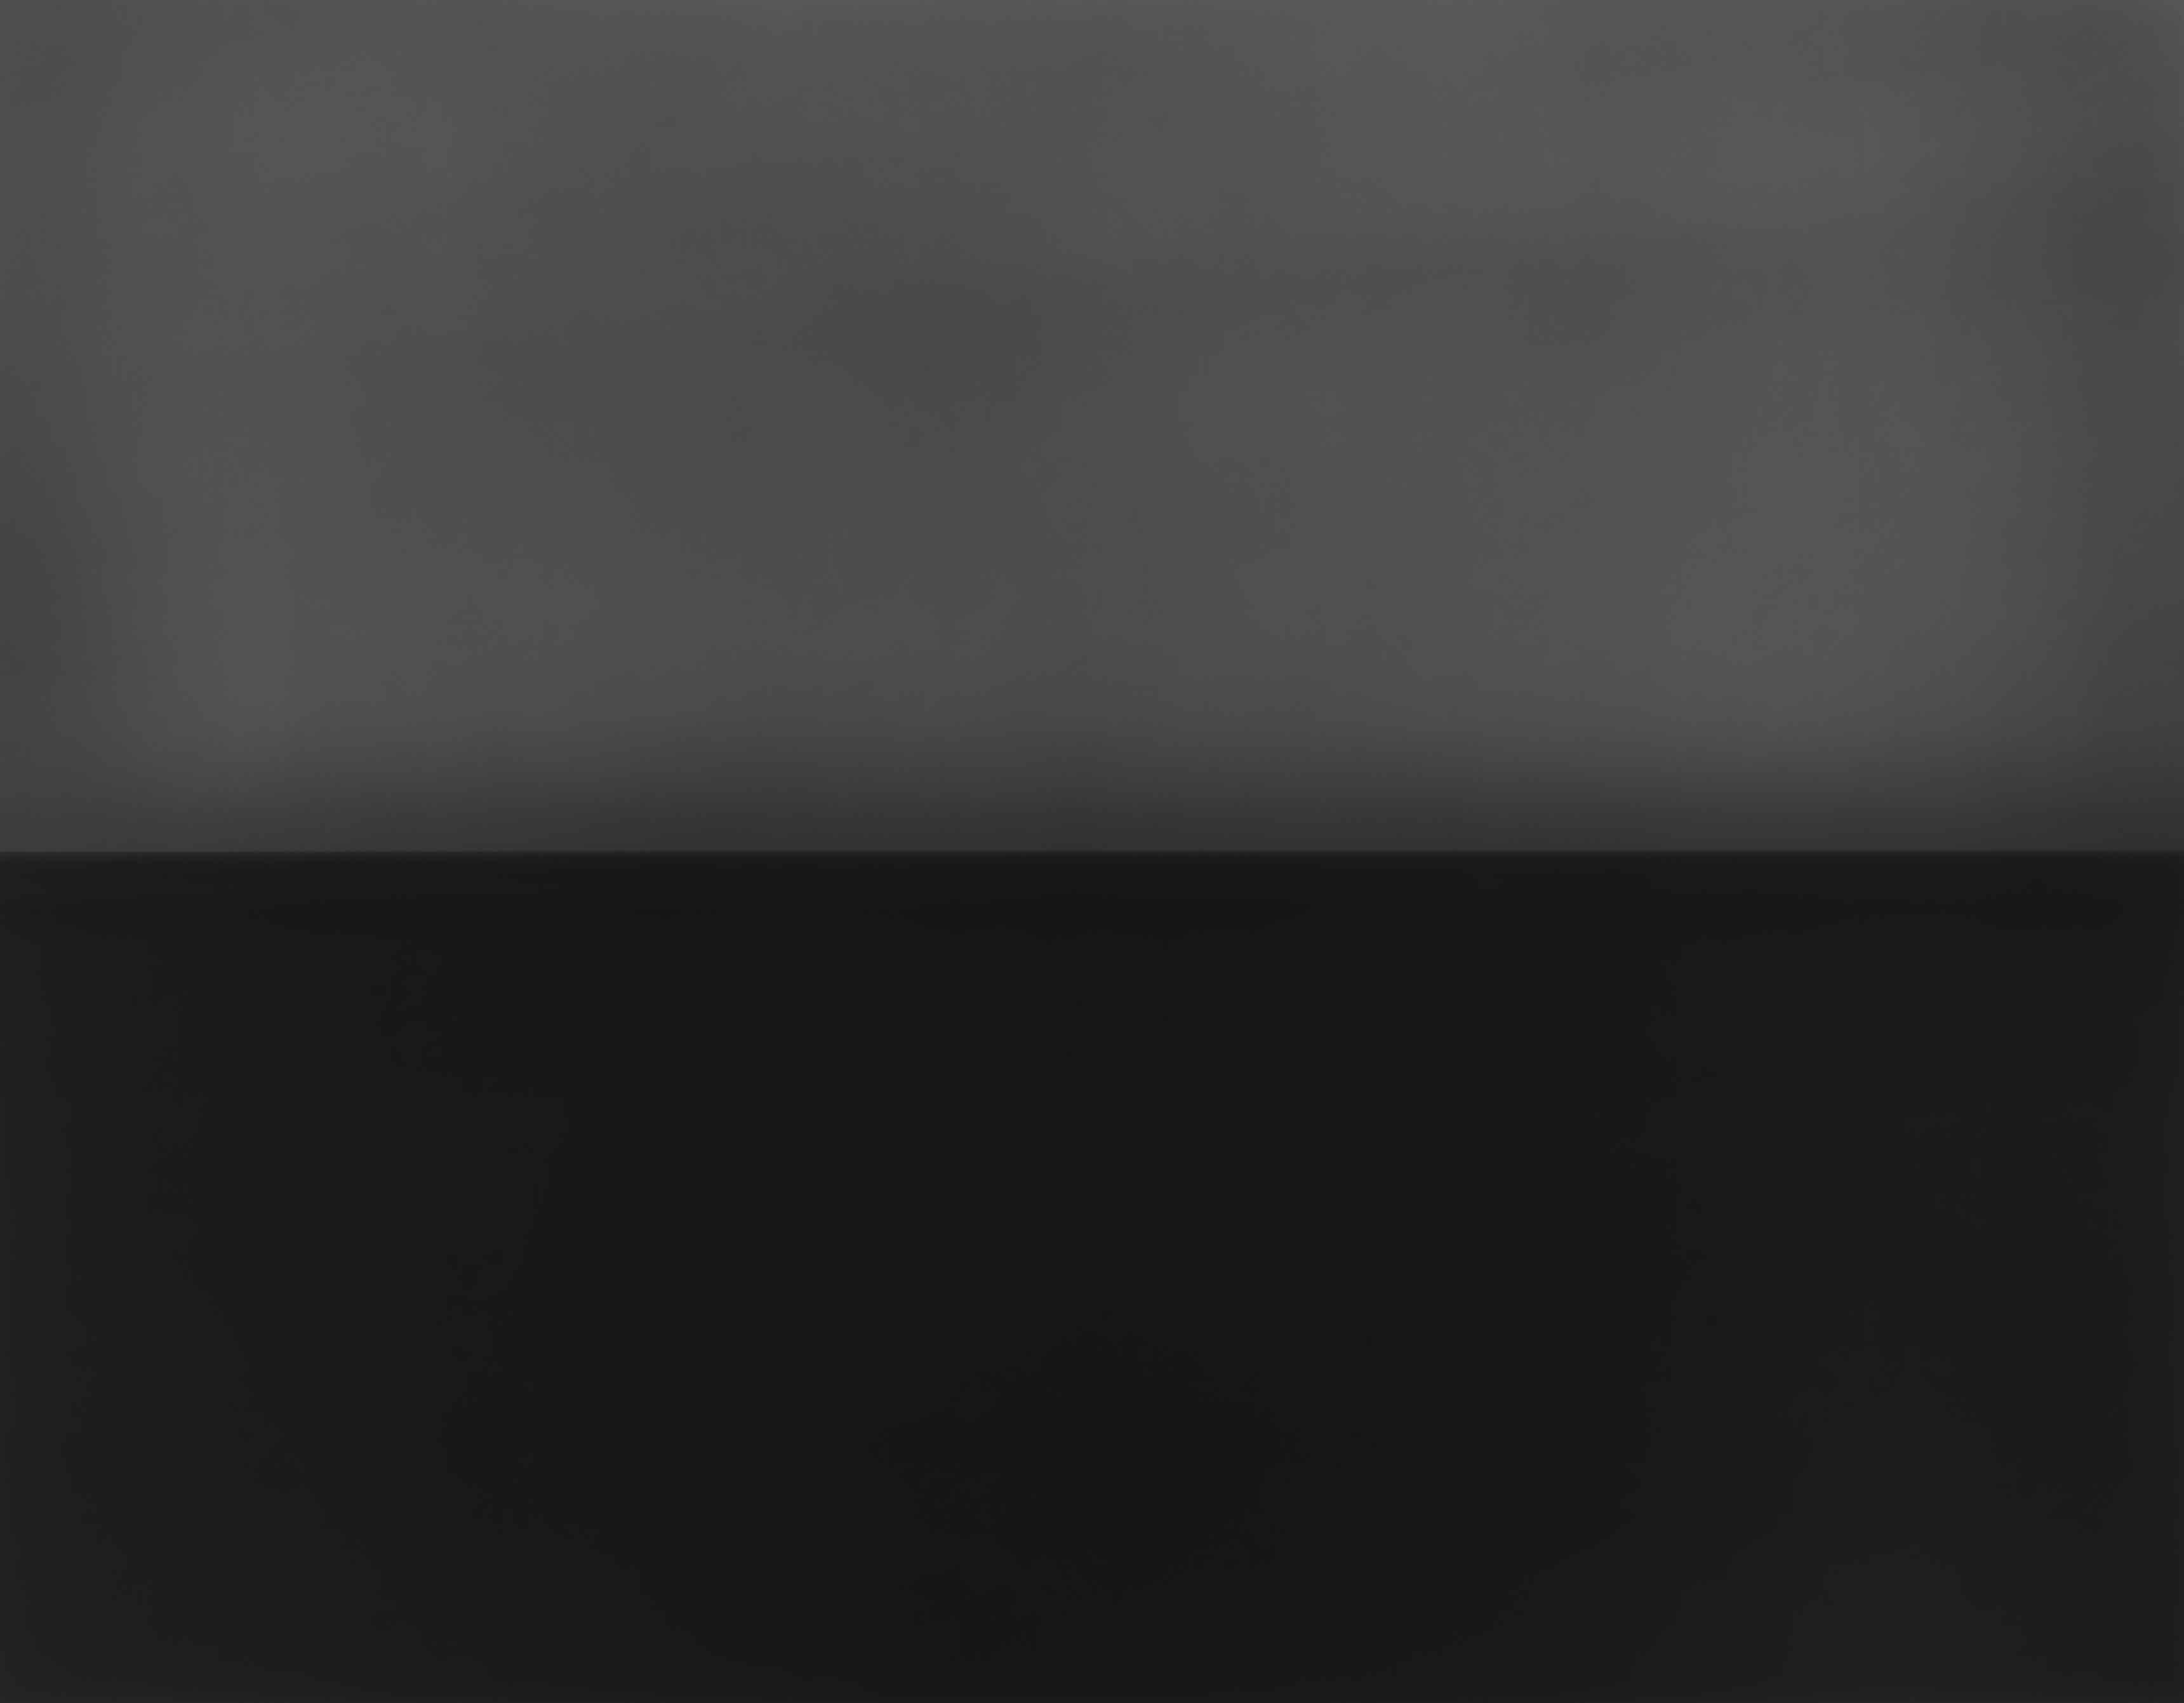 Hiroshi Sugimoto, Tasman Sea, Marion Bay, 2017 Epreuve gélatino-argentique Neg. #606 Image: 47 x 58 3/4 in. (119.4 x 149.2 cm) Cadre : 60 11/16 x 71 3/4 in. (154.2 x 182.2 cm) Edition de 5 No. 20198